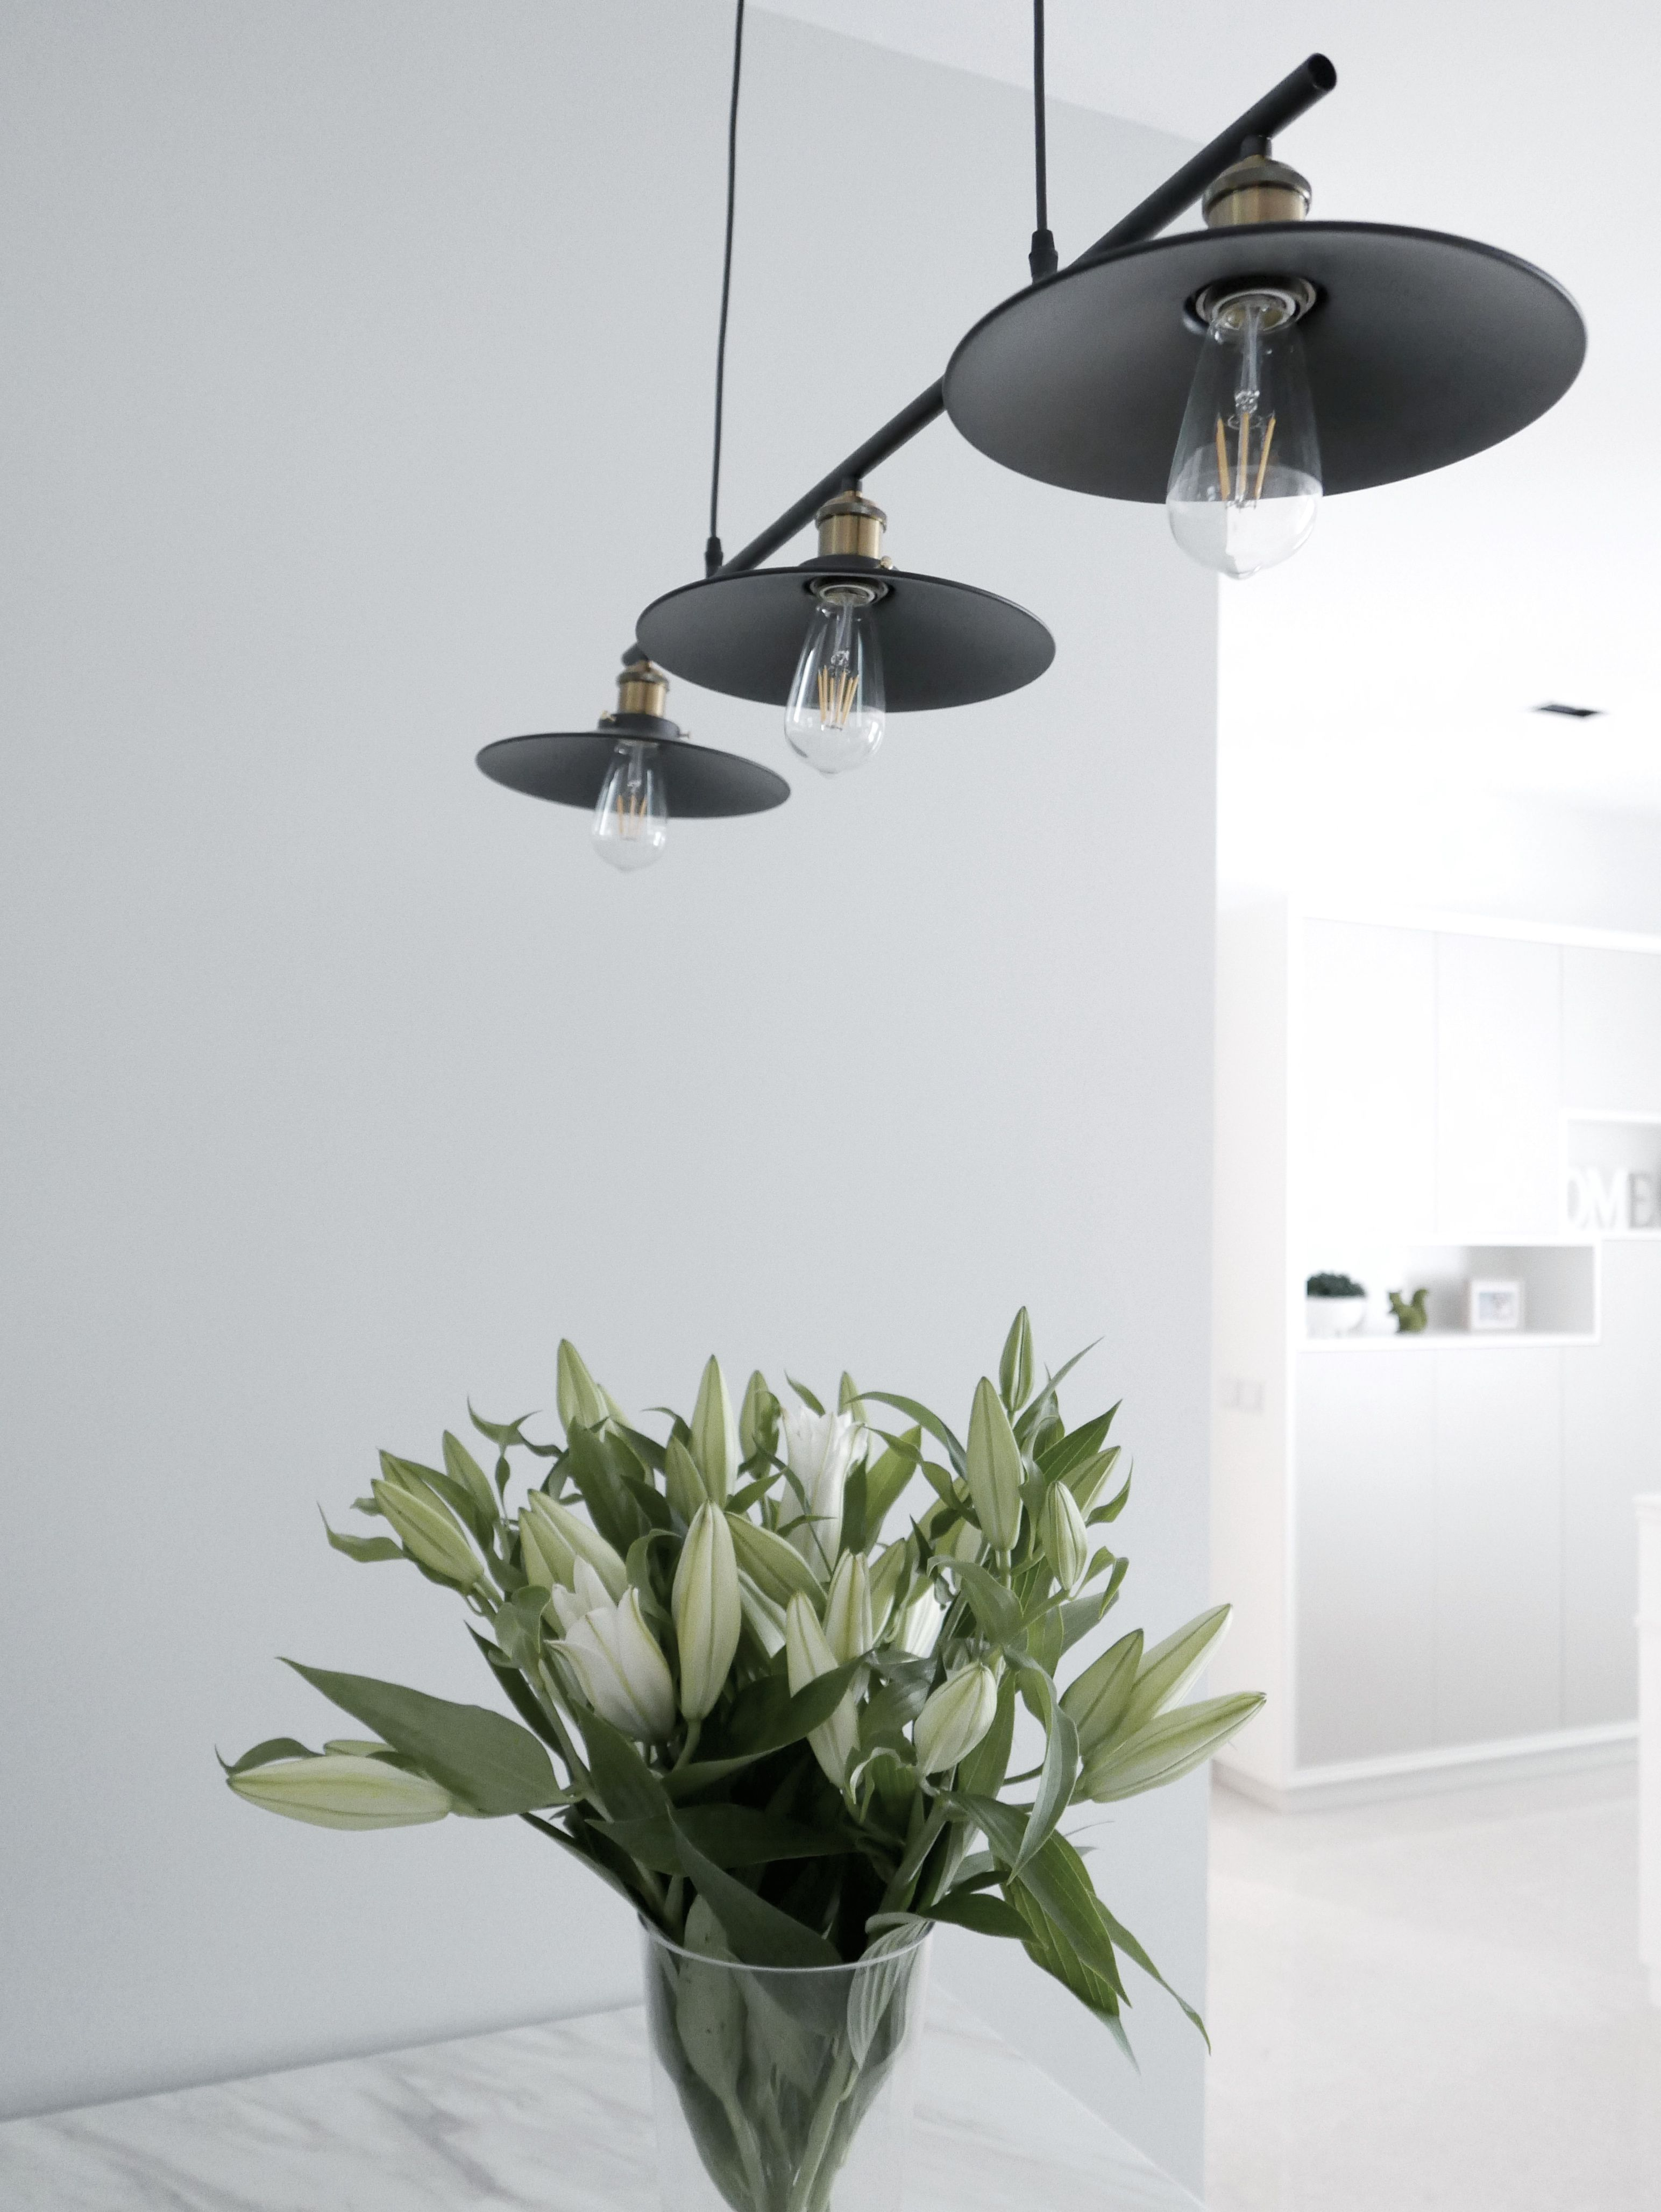 Ceiling lights + Plant | Ceiling lights, Interior ...